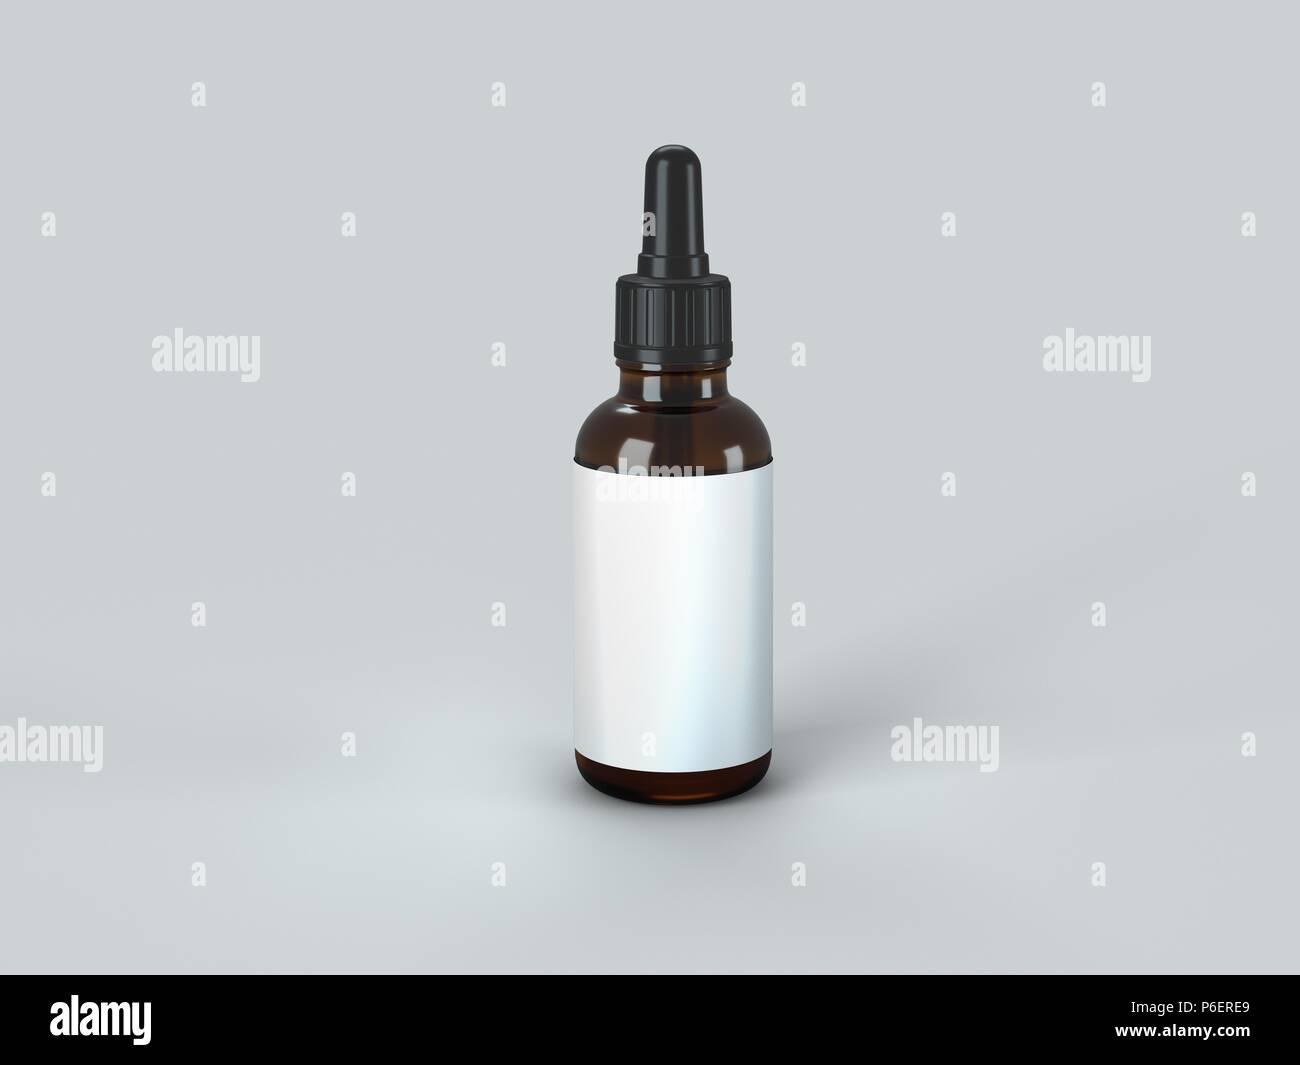 Dropper Bottle Mock-Up - Blank Label - Stock Image